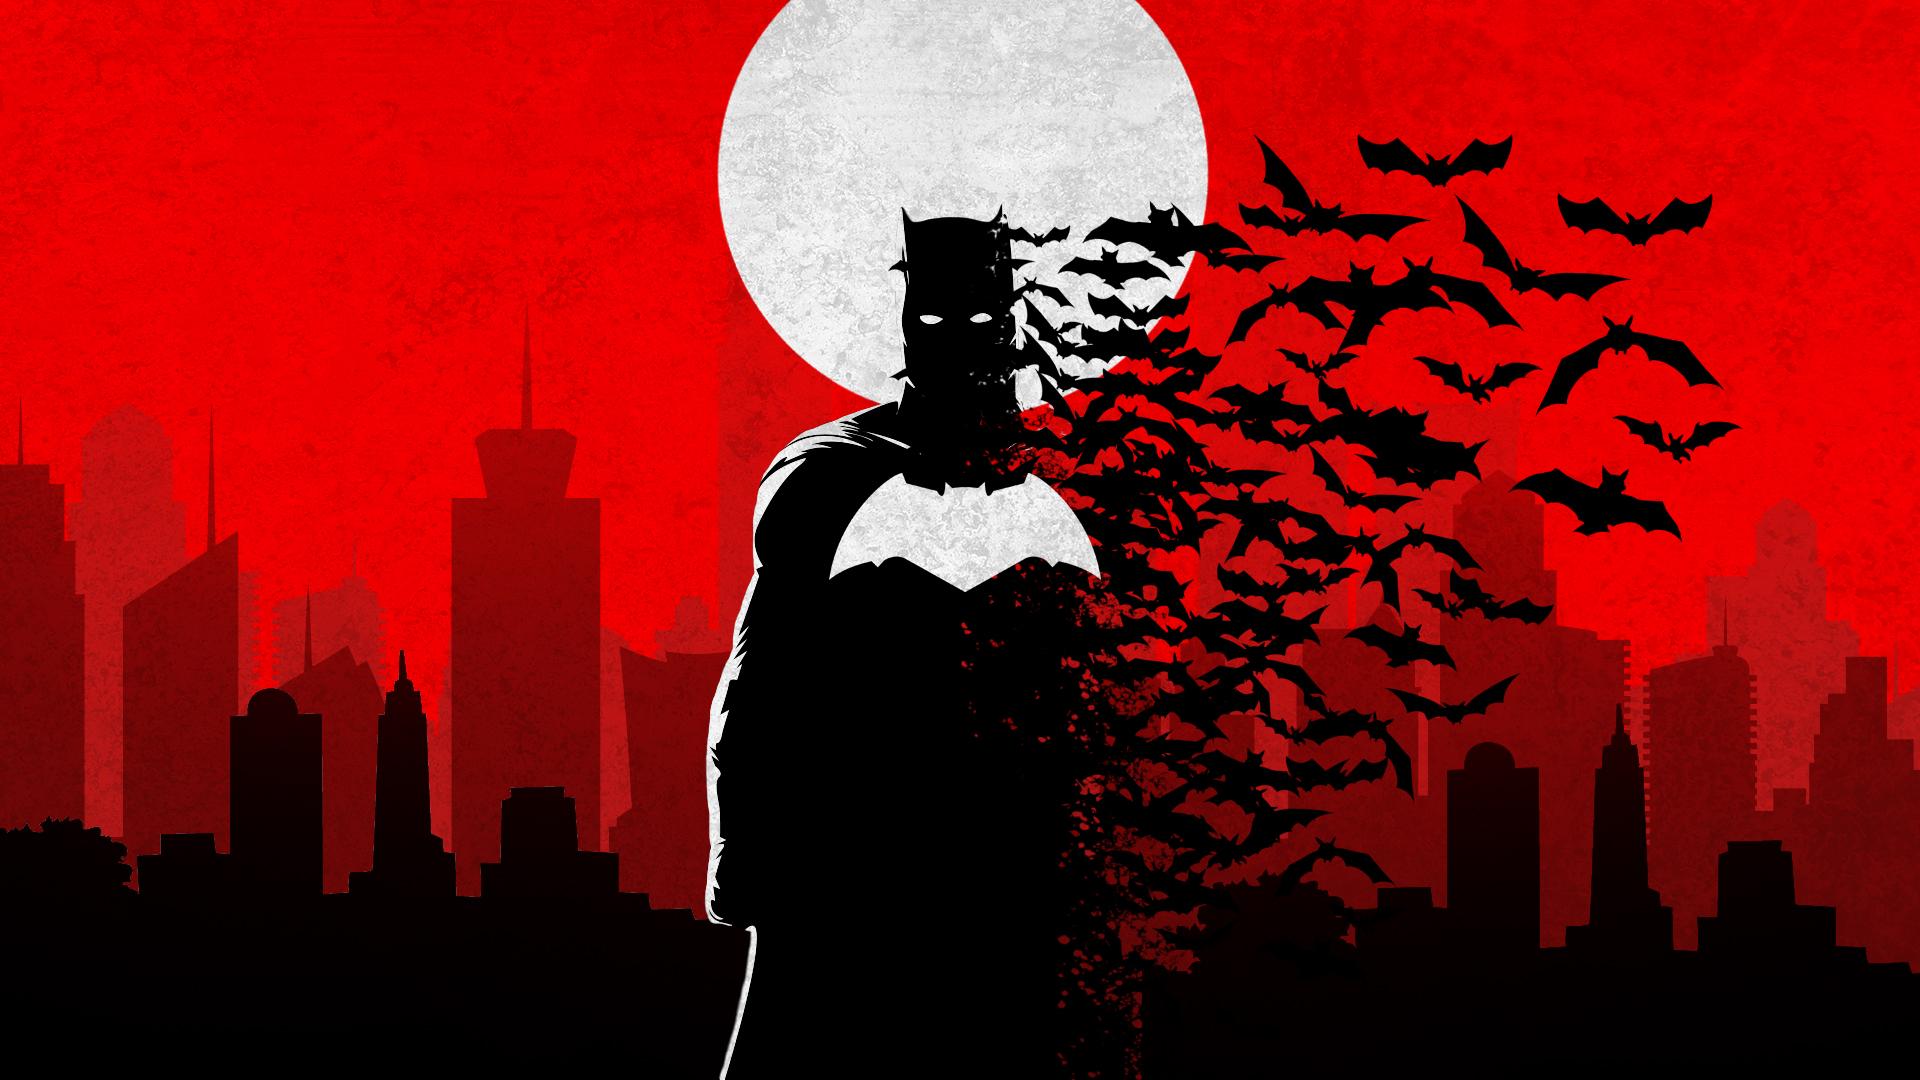 Batman Minimalist Wallpaper (by TheKevinMevlana)